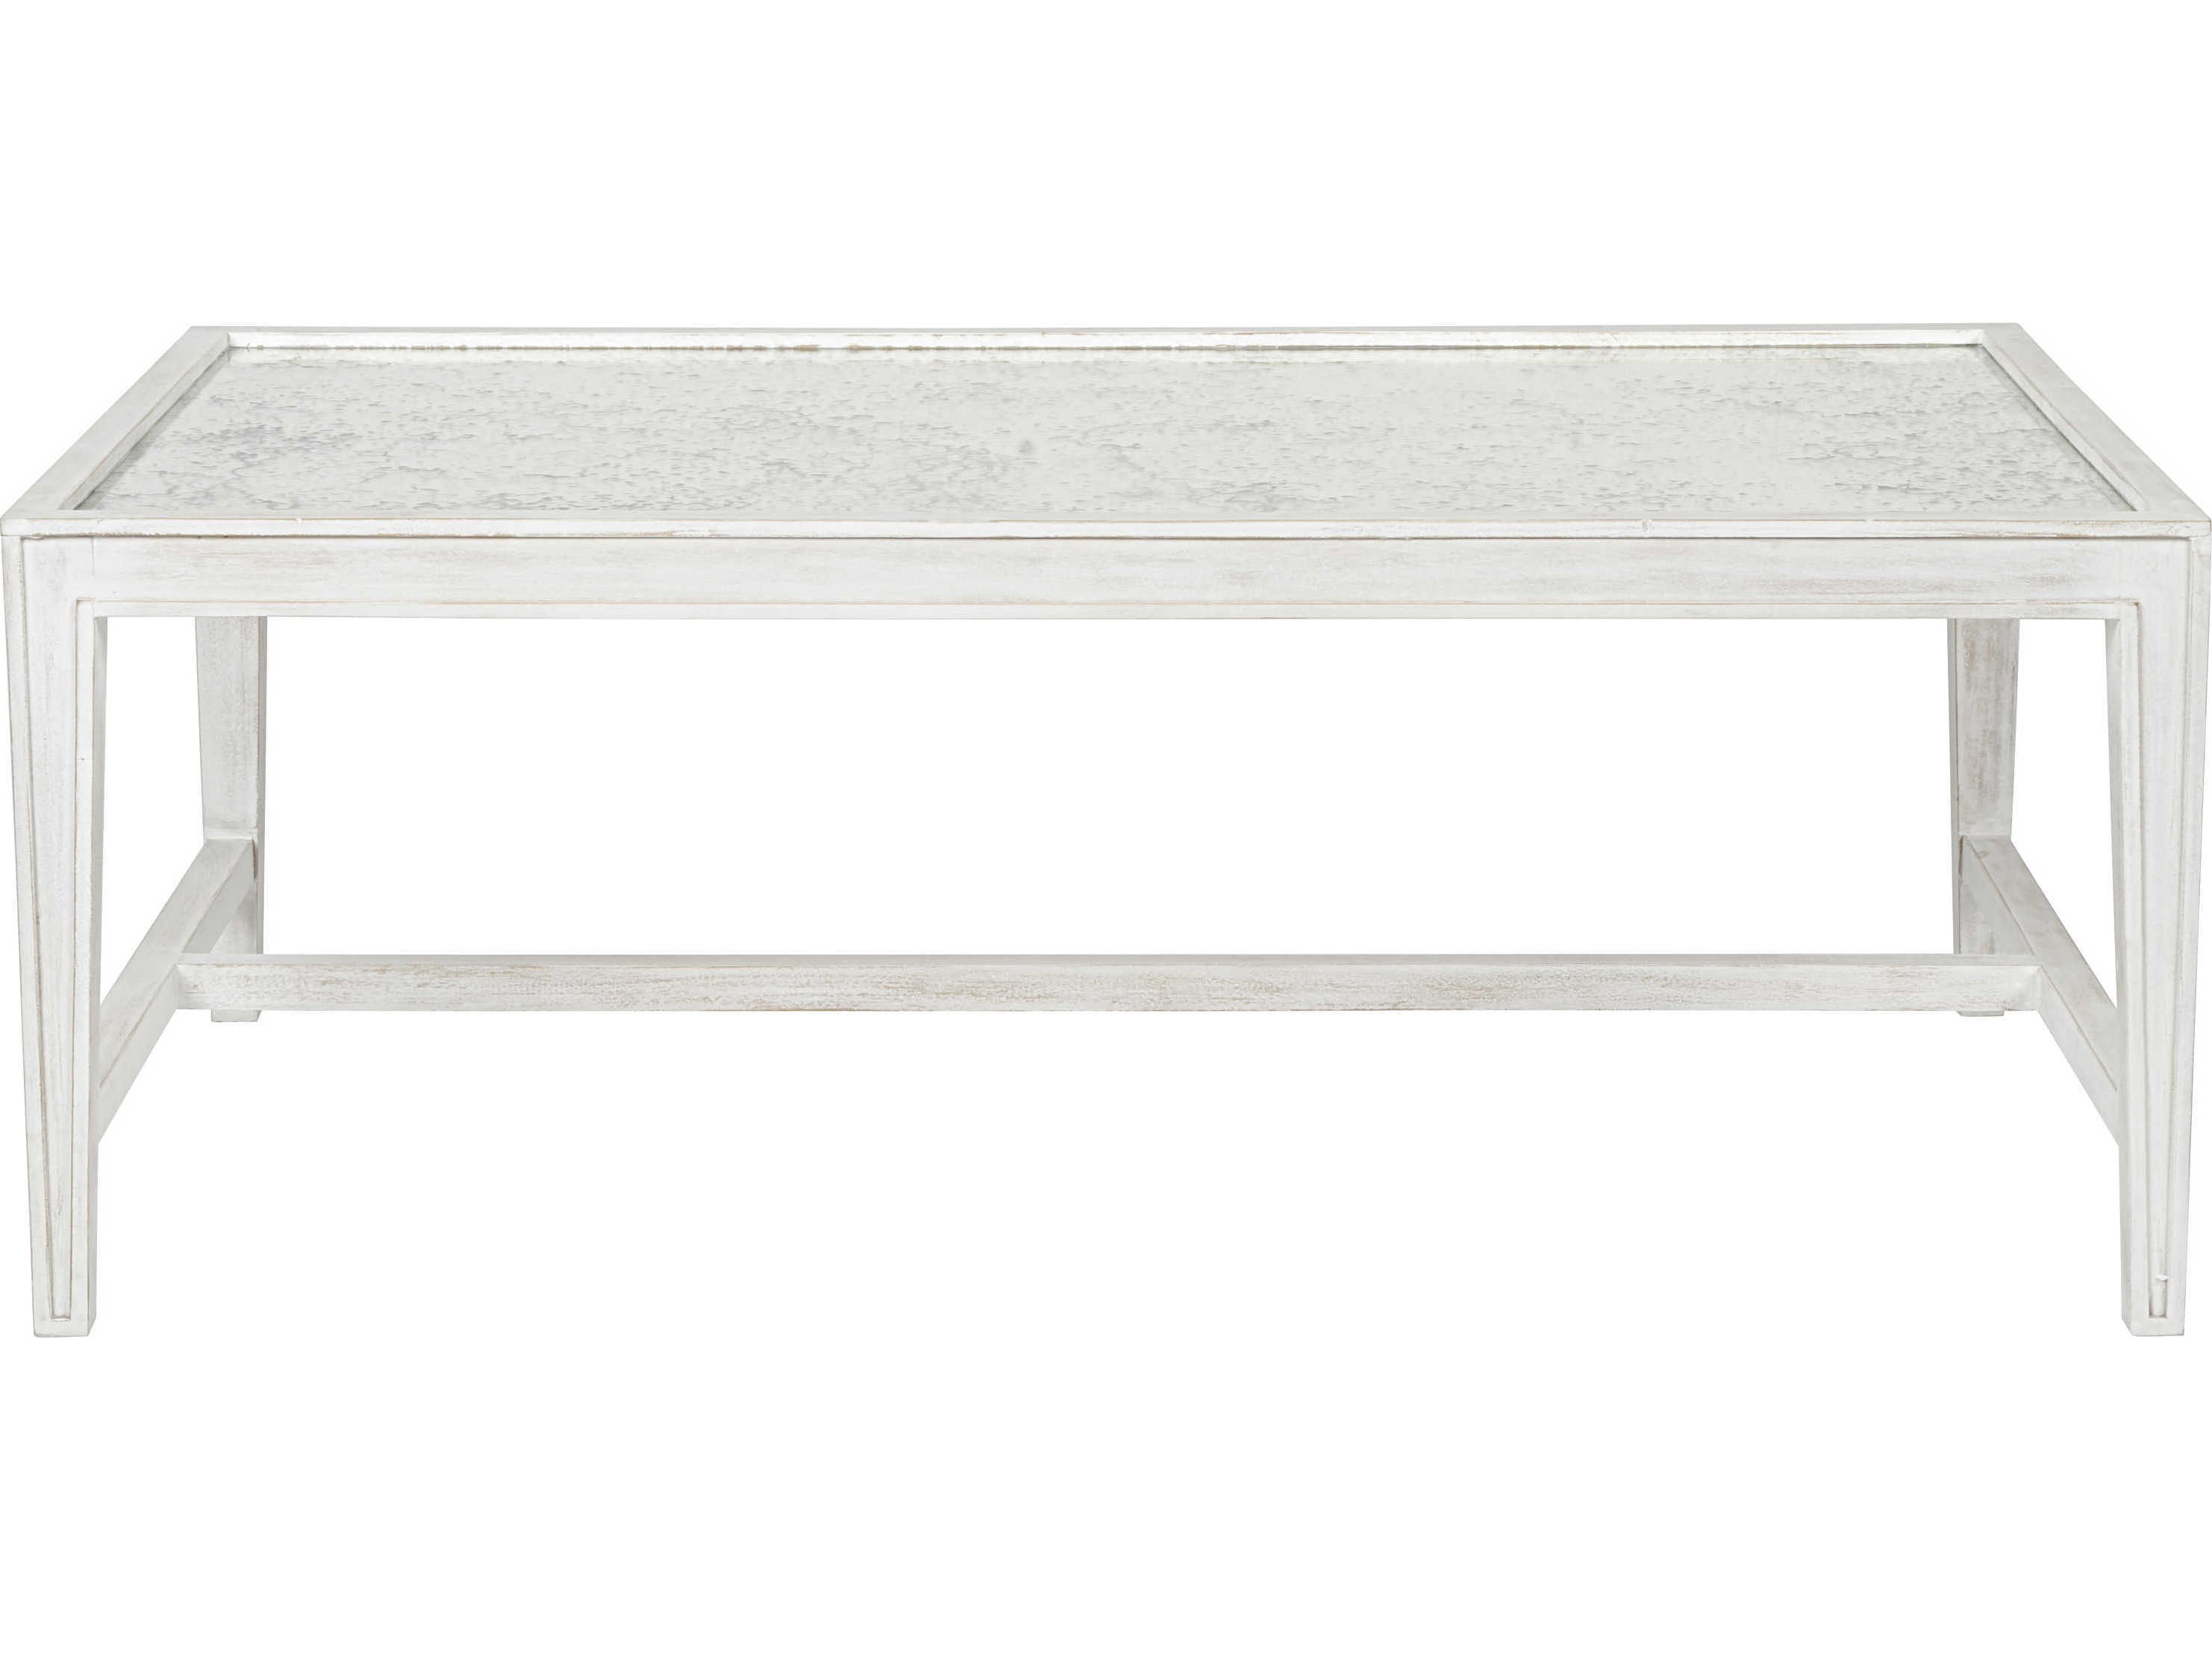 Noir Furniture Imperial White Wash 48'' X 30'' Rectangular